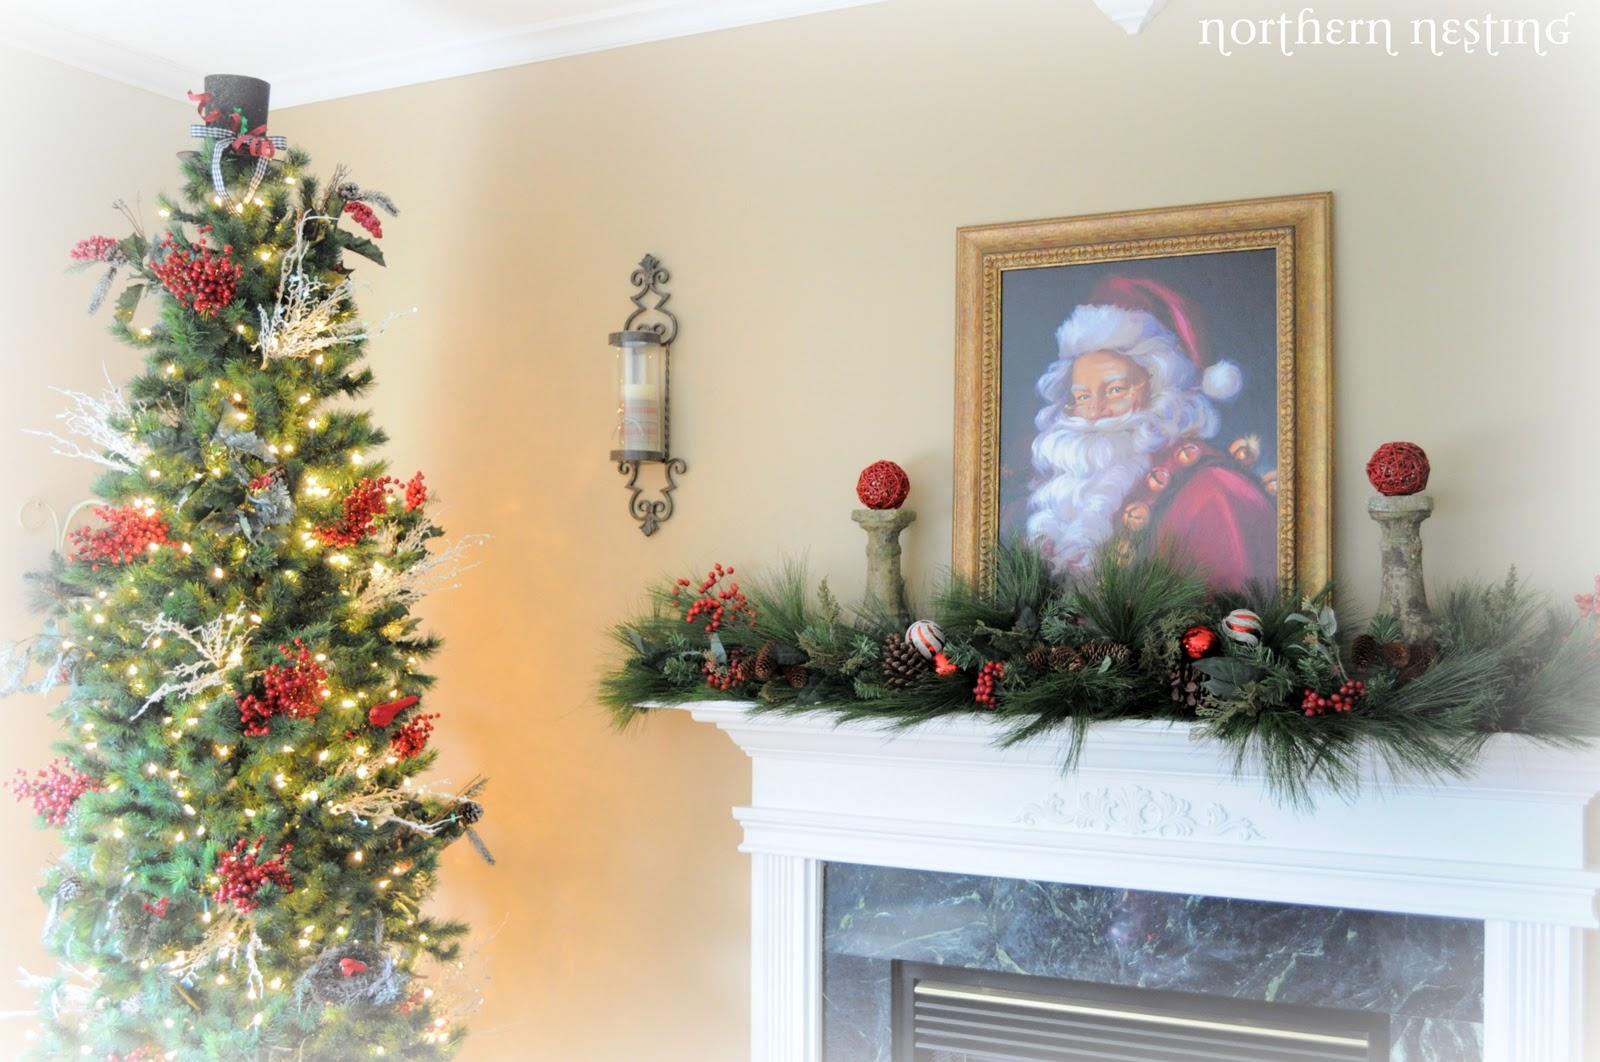 Northern Nesting: Oh Christmas Trees